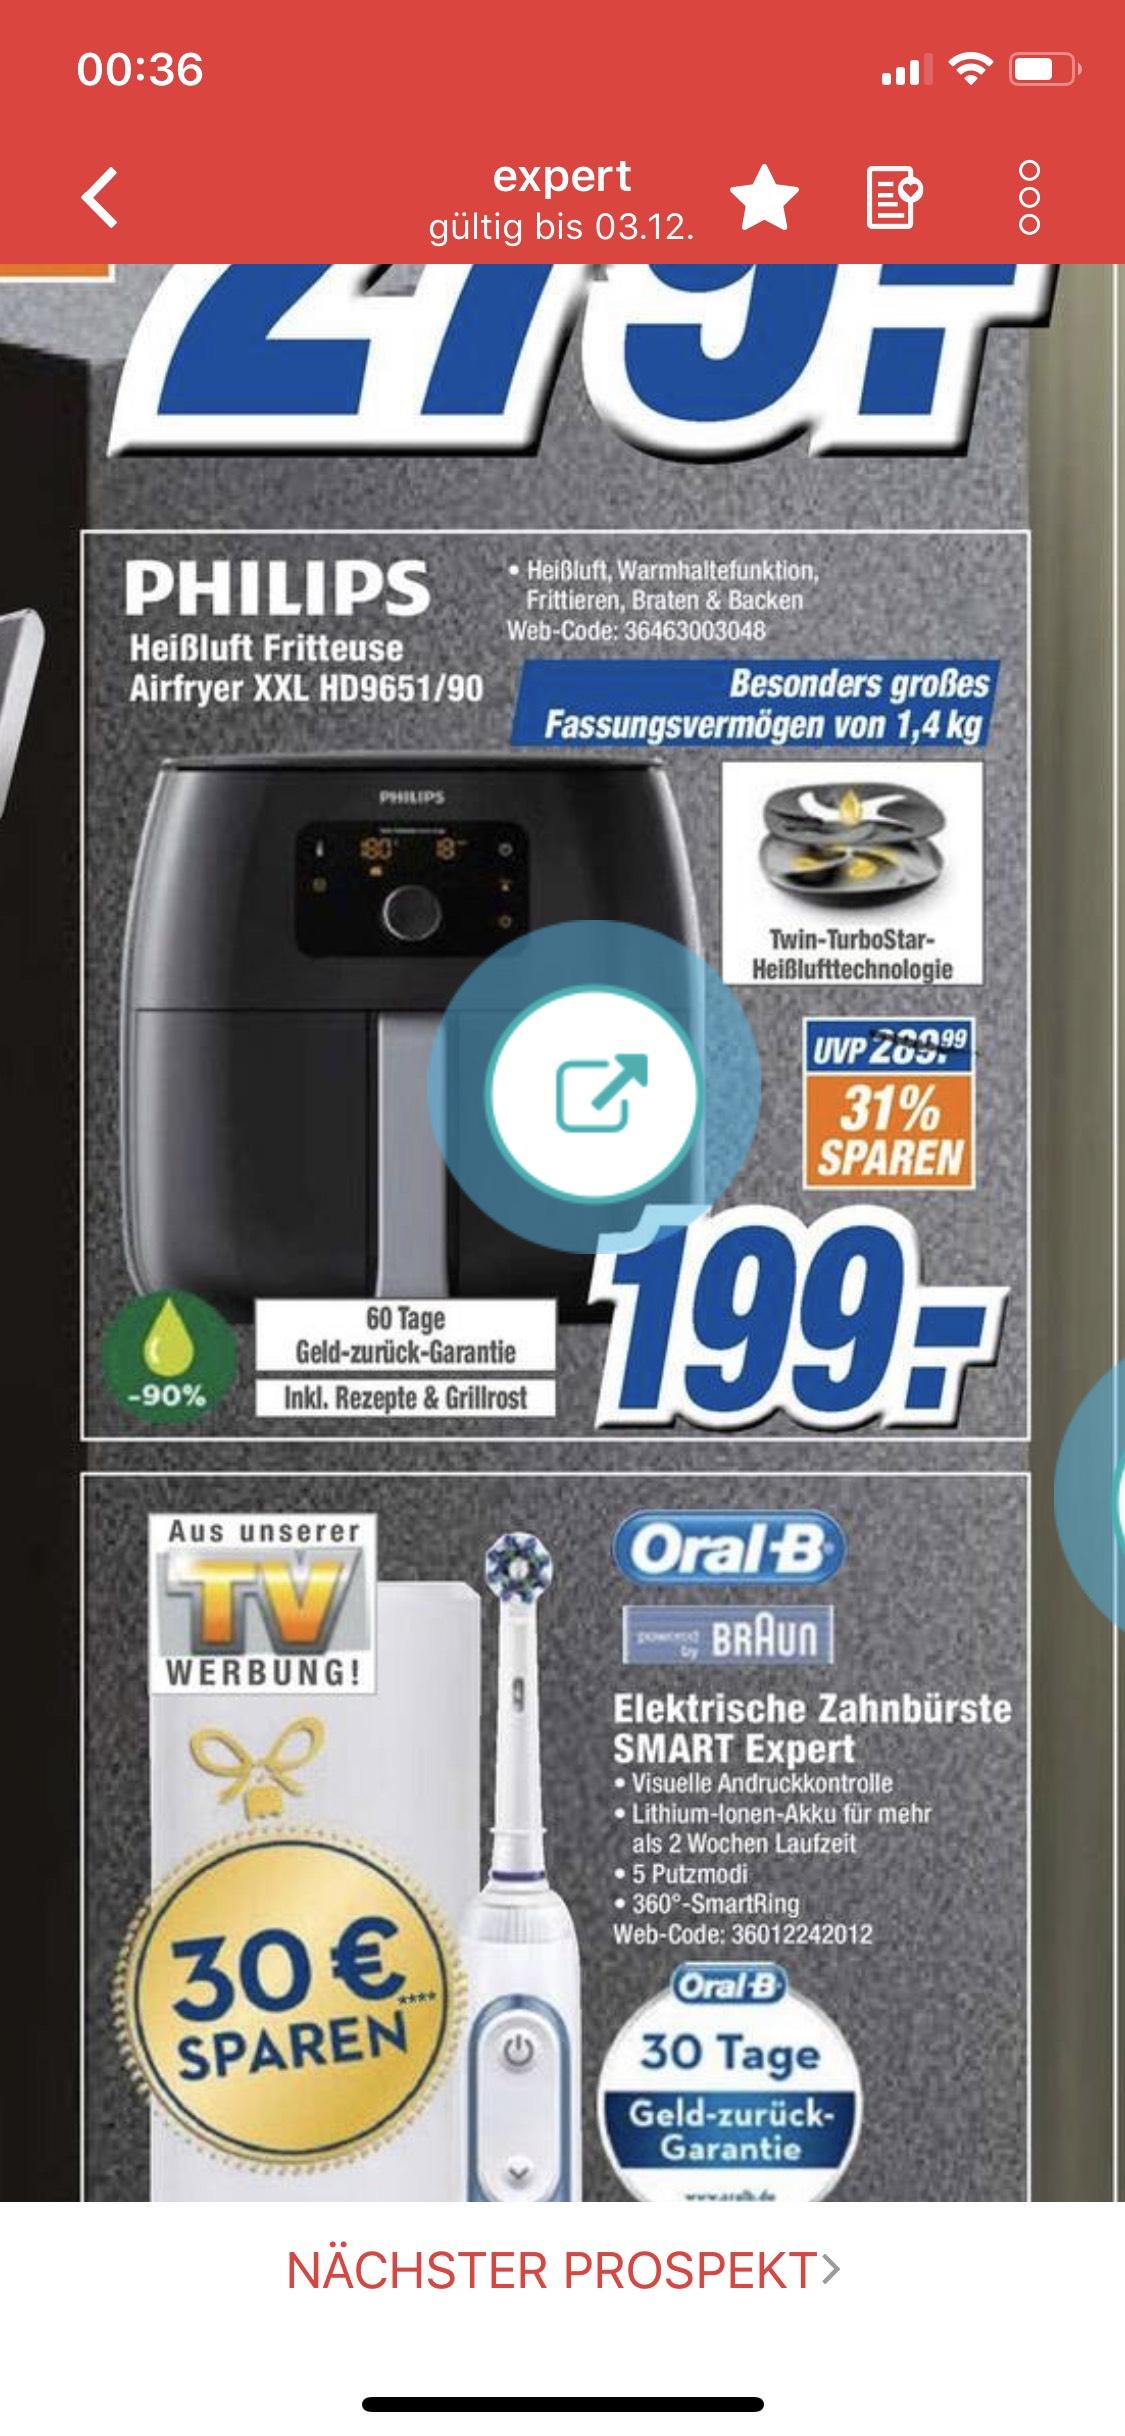 (LOKAL) Philips Avance Collection Airfryer XXL HD9651/90 für 199 € bei Expert in Neuss,Bergheim uvm